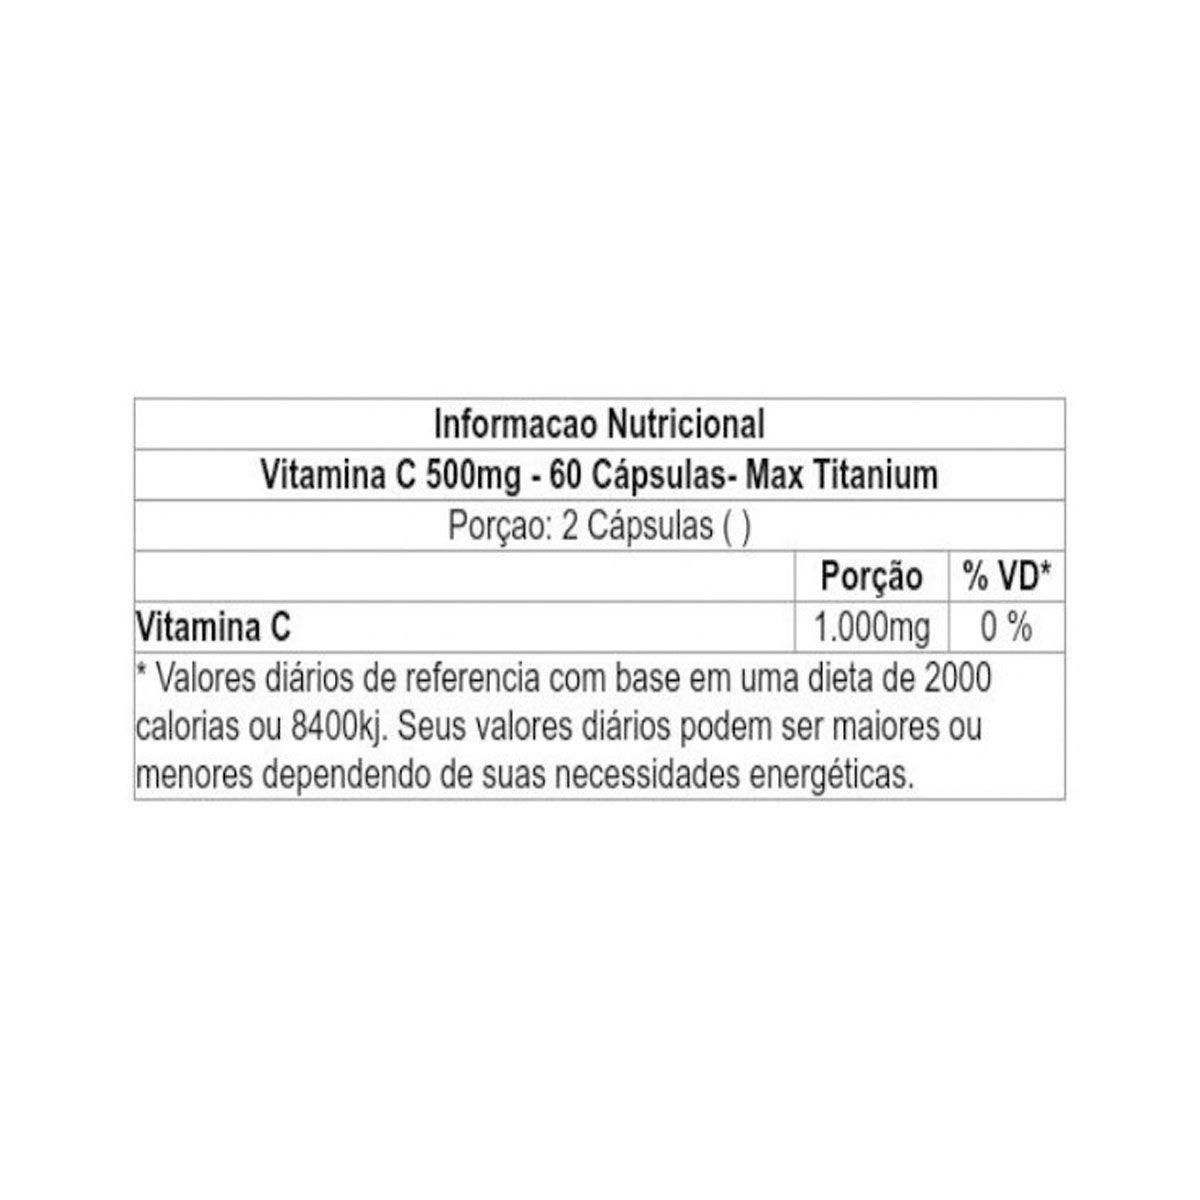 Vitamina C 500mg 60 Cápsulas- Max Titanium